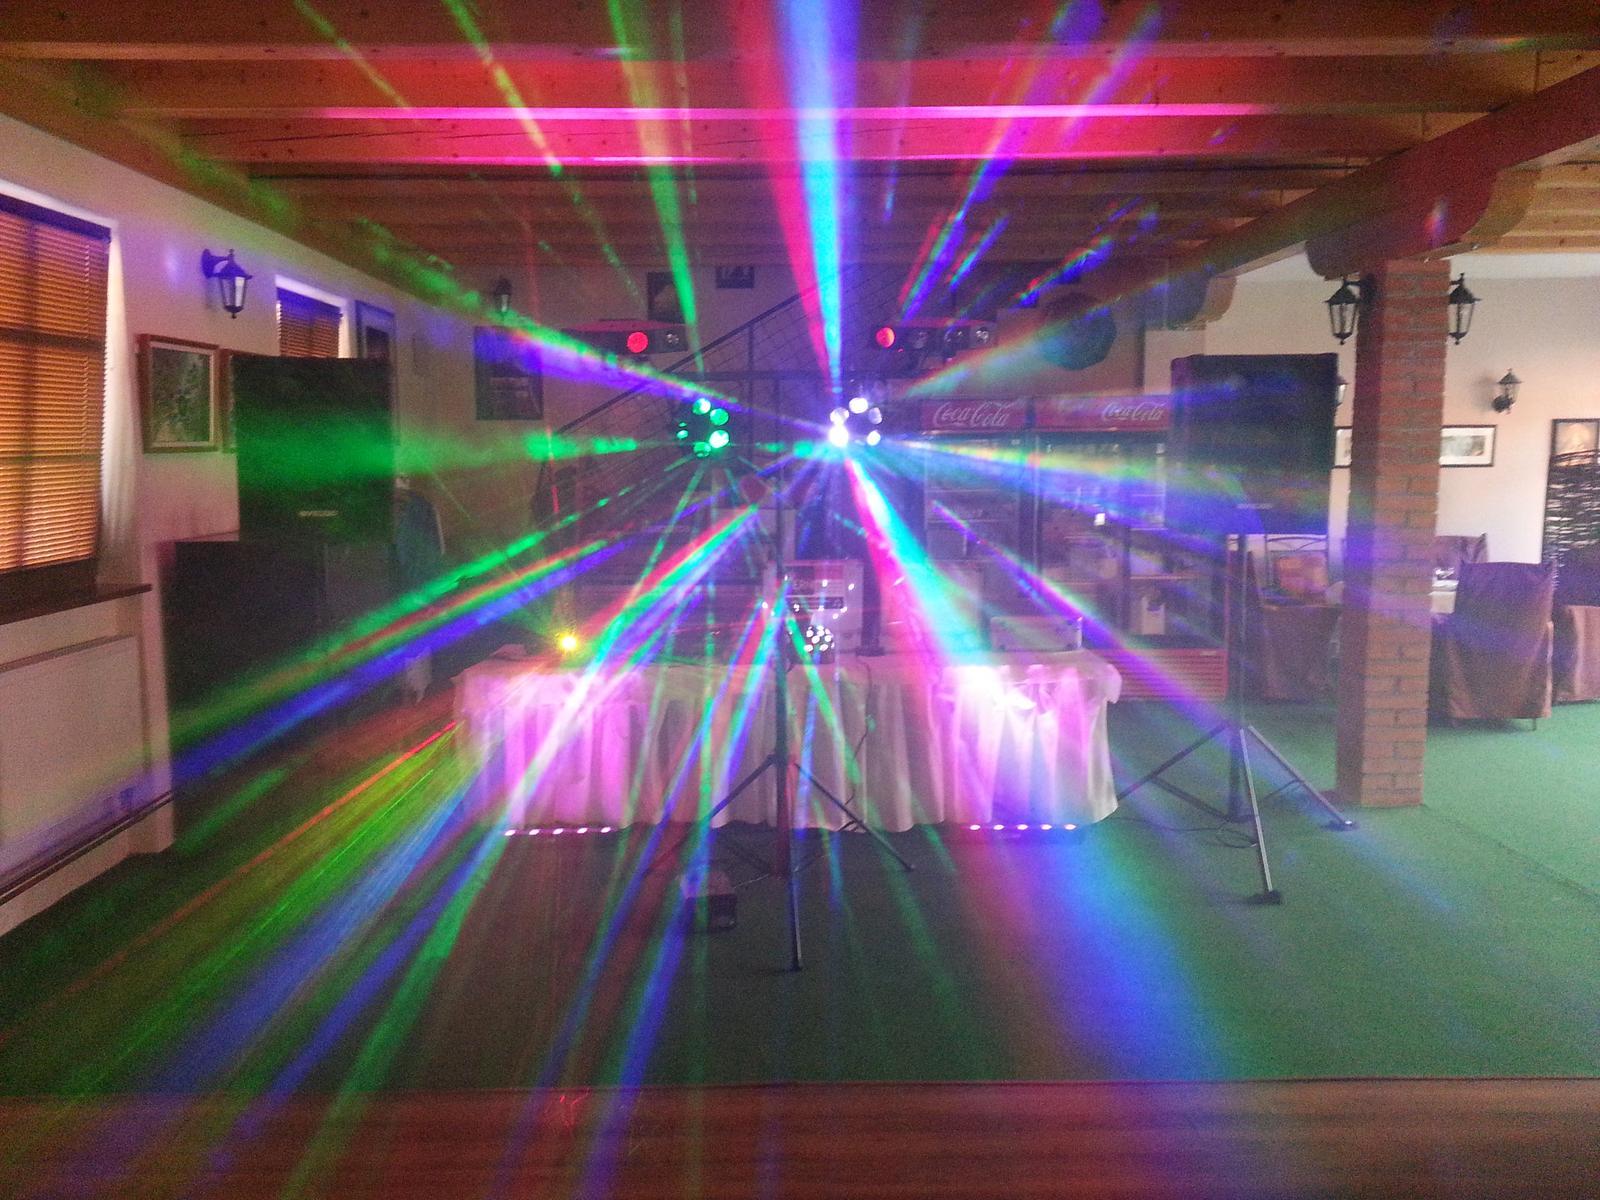 dj_erni - Svadba Hotel Phoenix v historickom srdci Trnavy - svetelný park pripravený